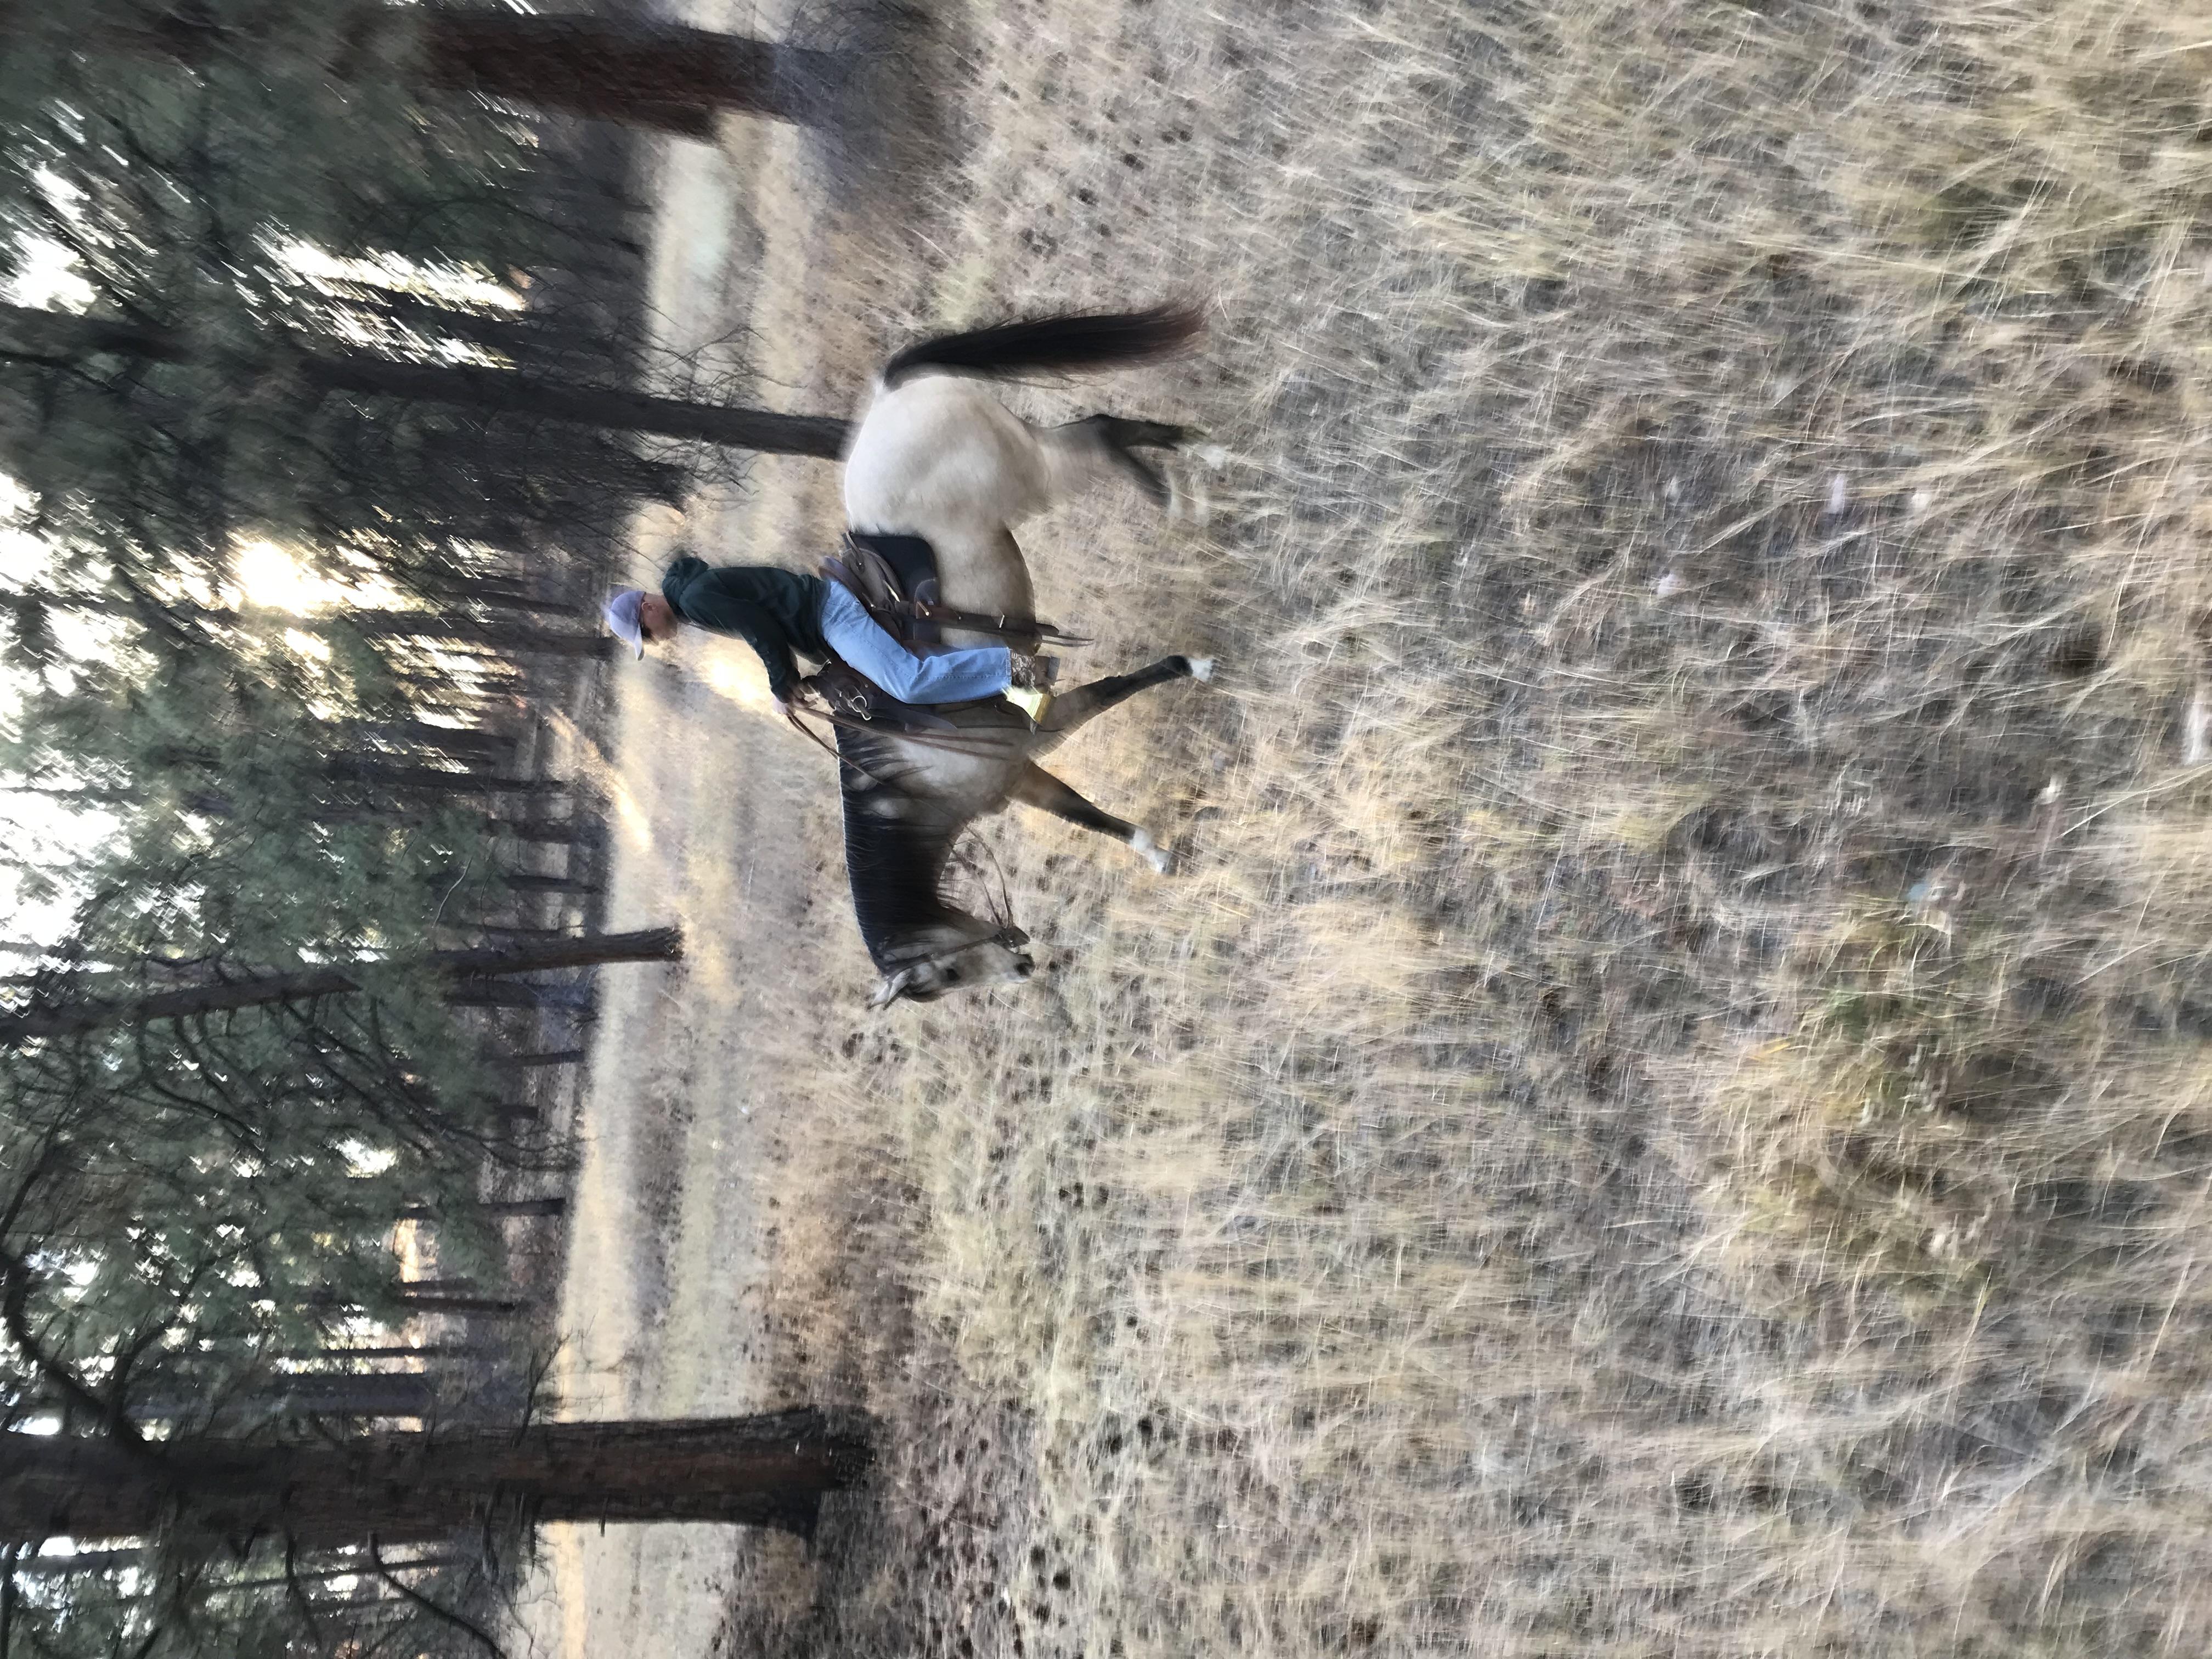 rider on trail ride